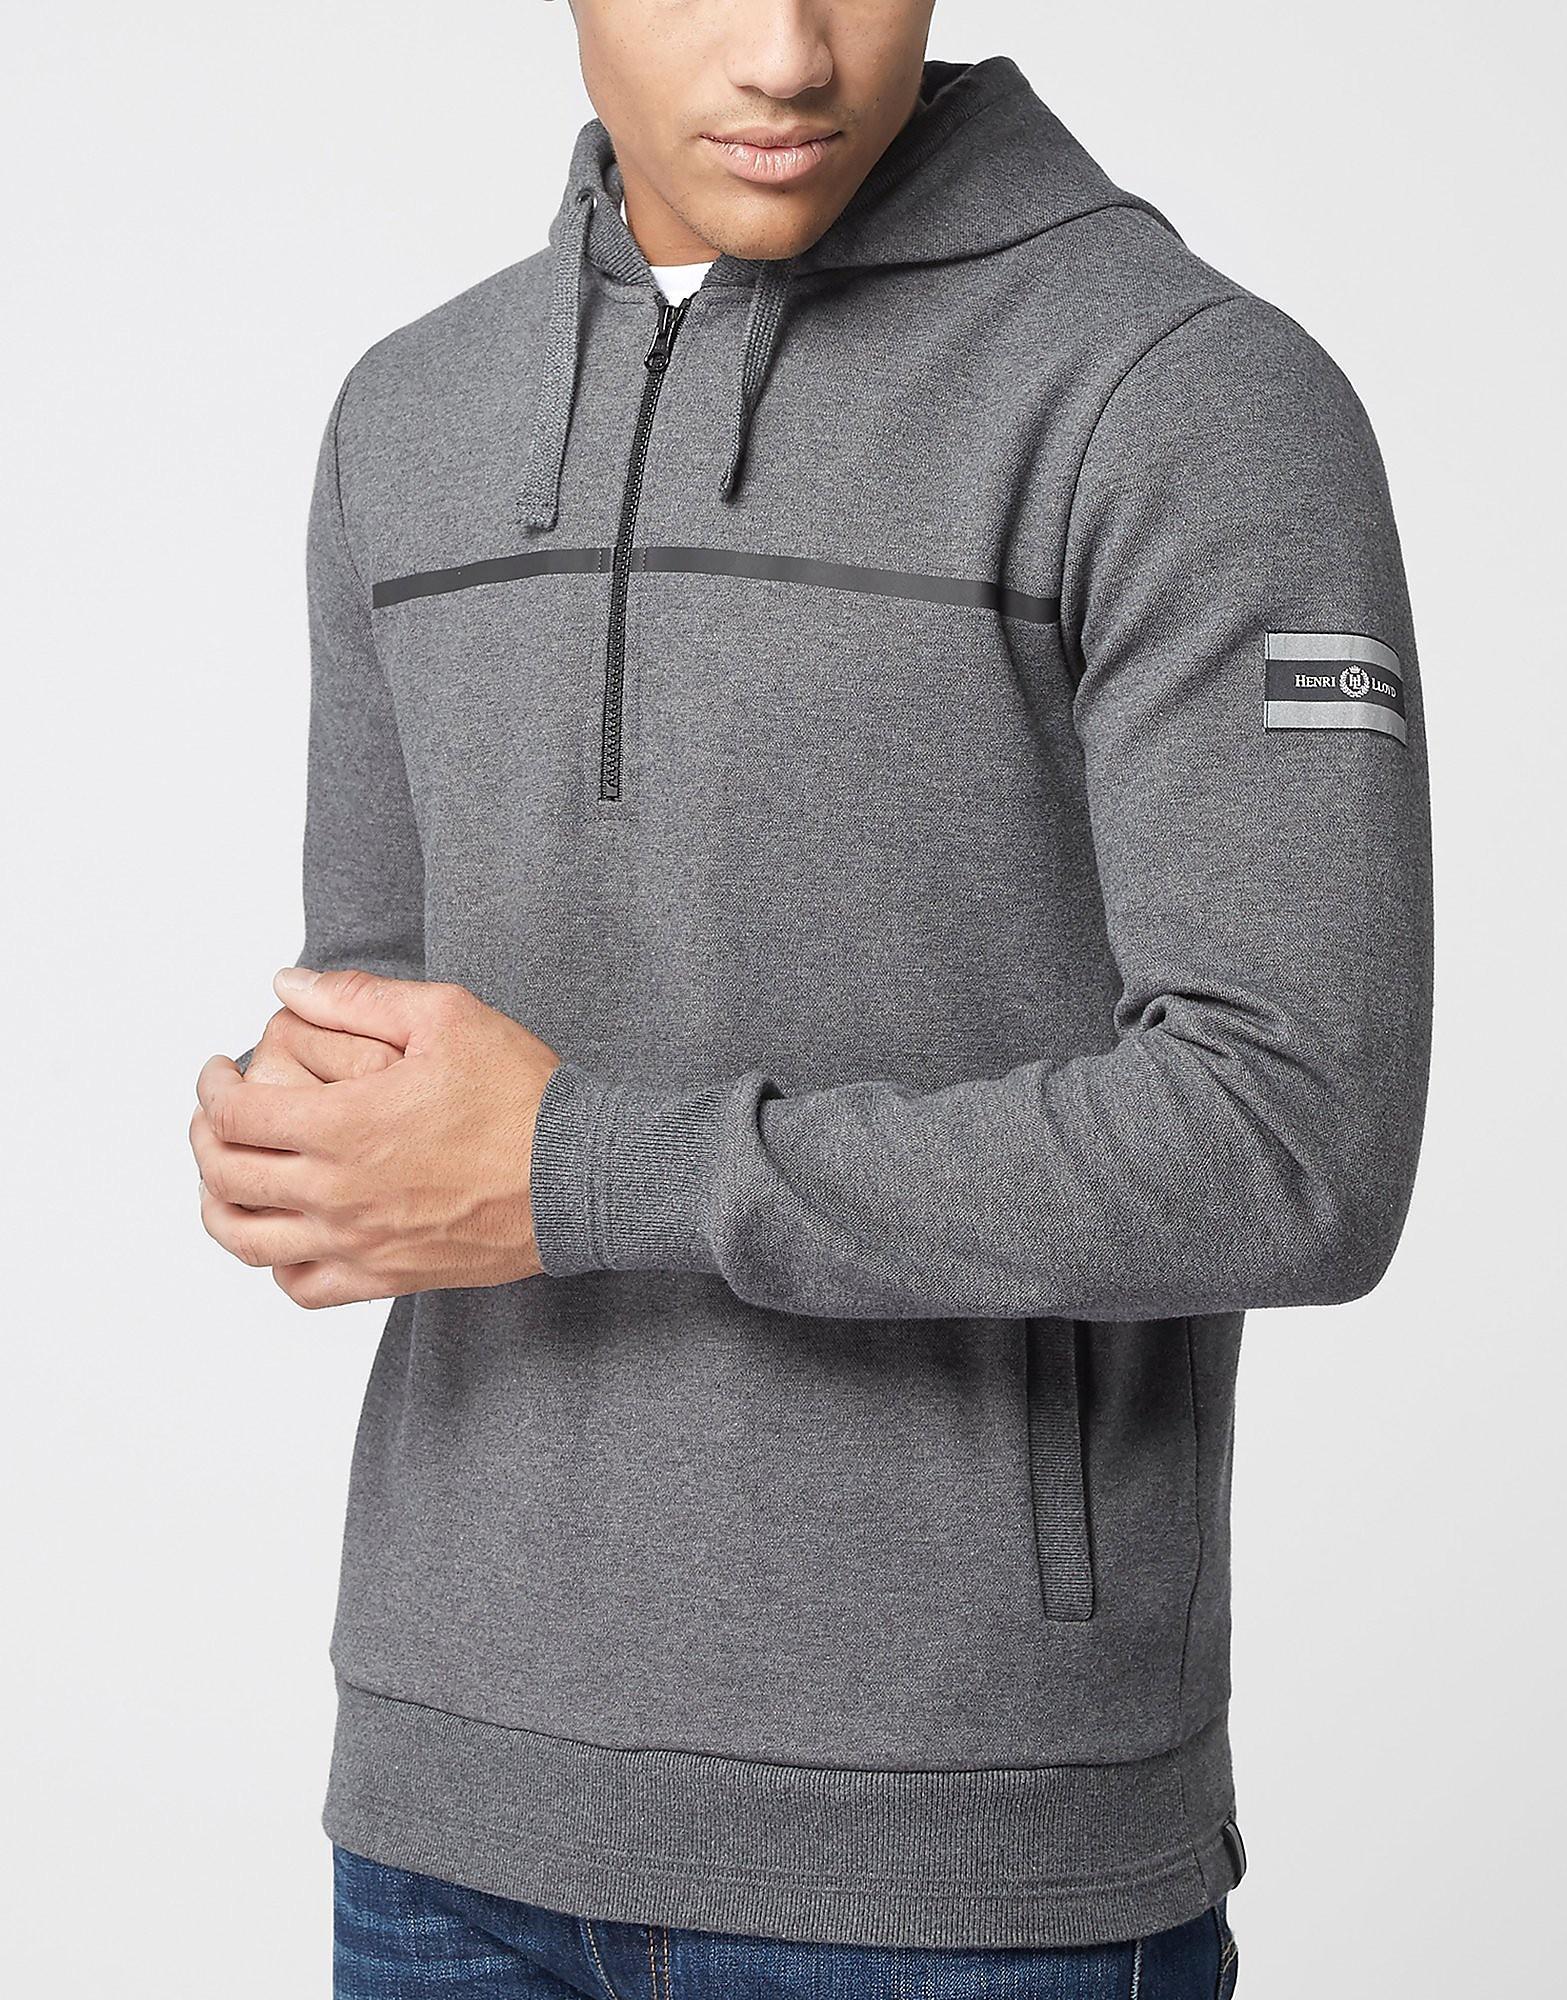 Henri Lloyd 1/2 Zip Hooded Sweatshirt